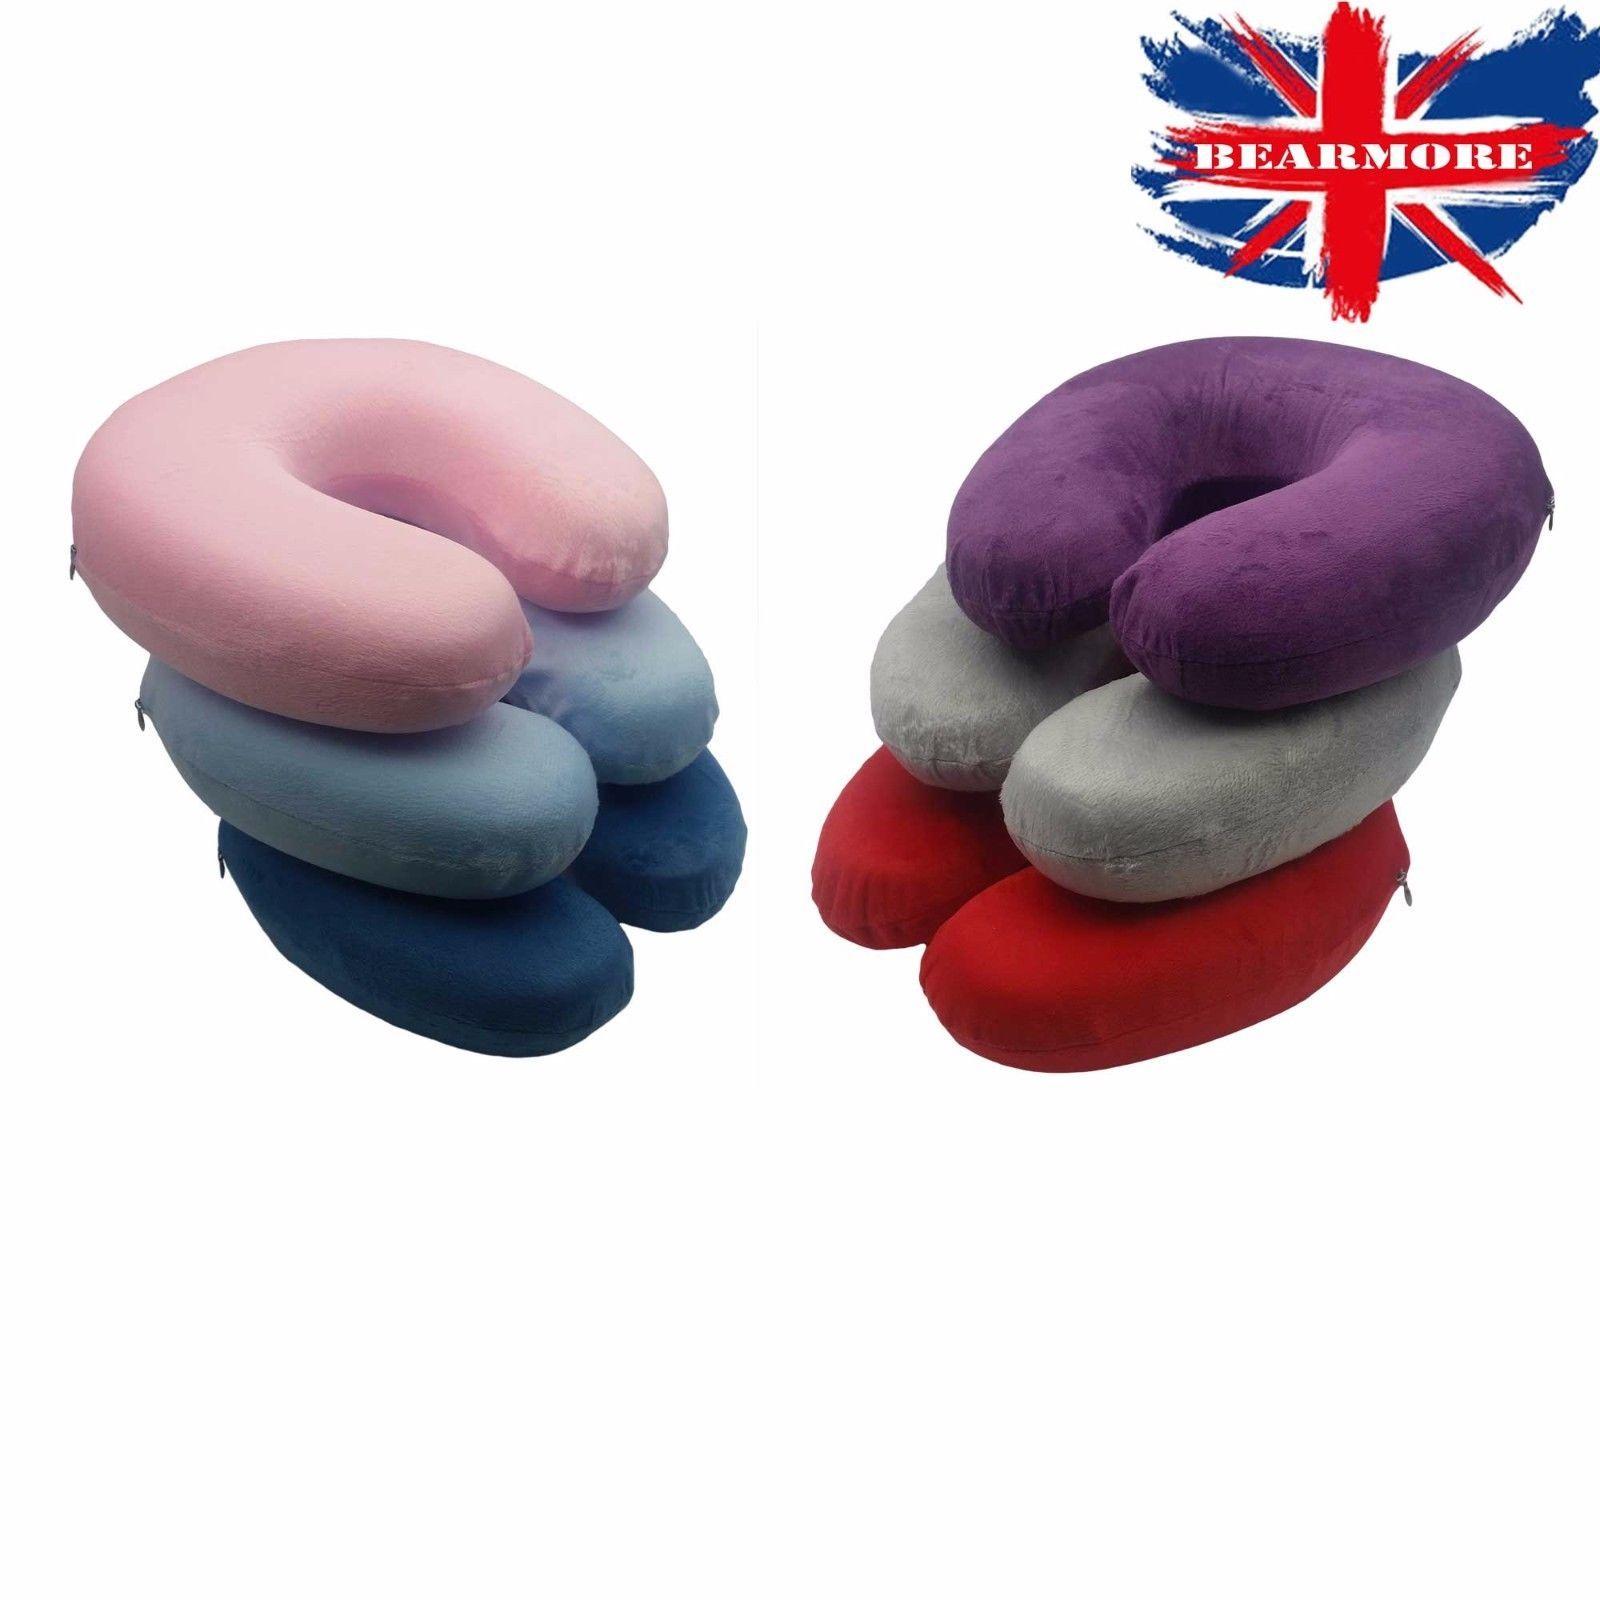 Travel neck pillow memory foam cushion soft u shape support headrest